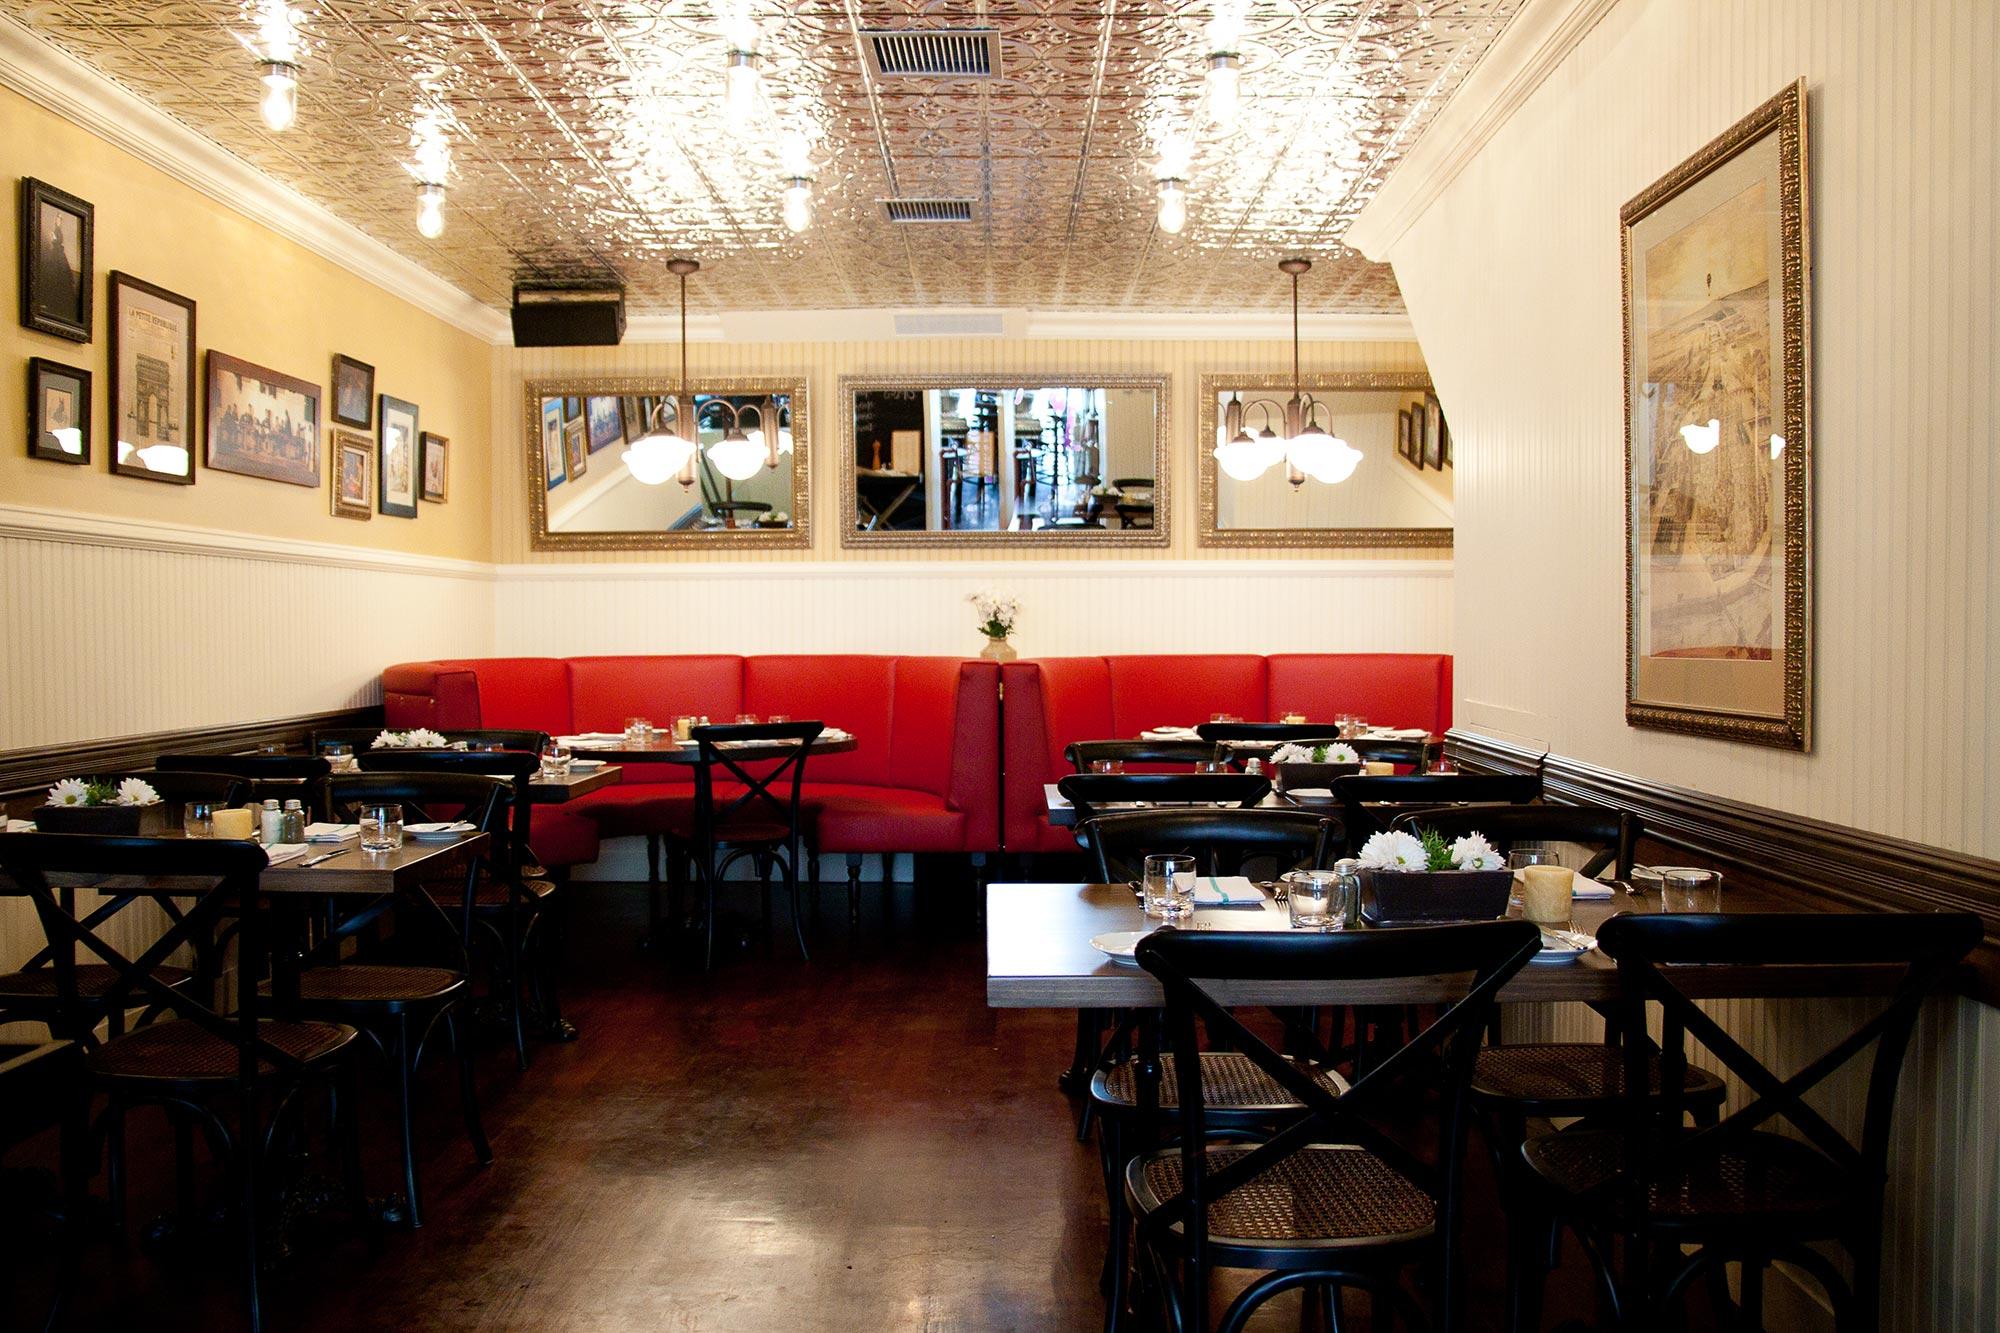 interior-design-french-restaurant-dining-room.jpg